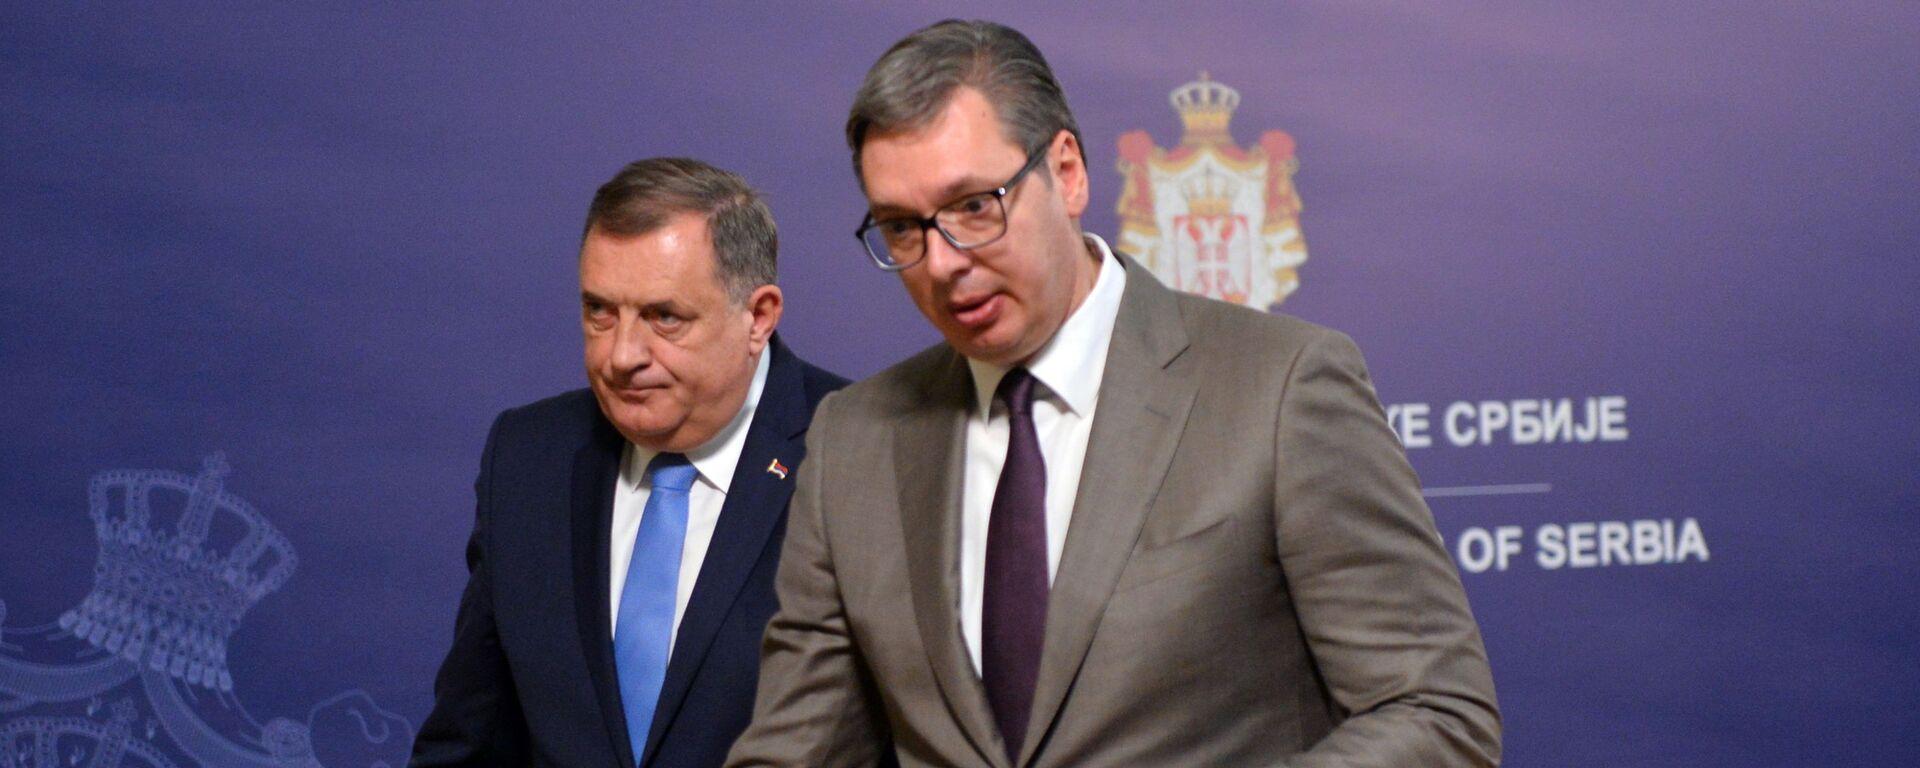 Aleksandar Vučić i Milorad Dodik - Sputnik Srbija, 1920, 26.08.2021